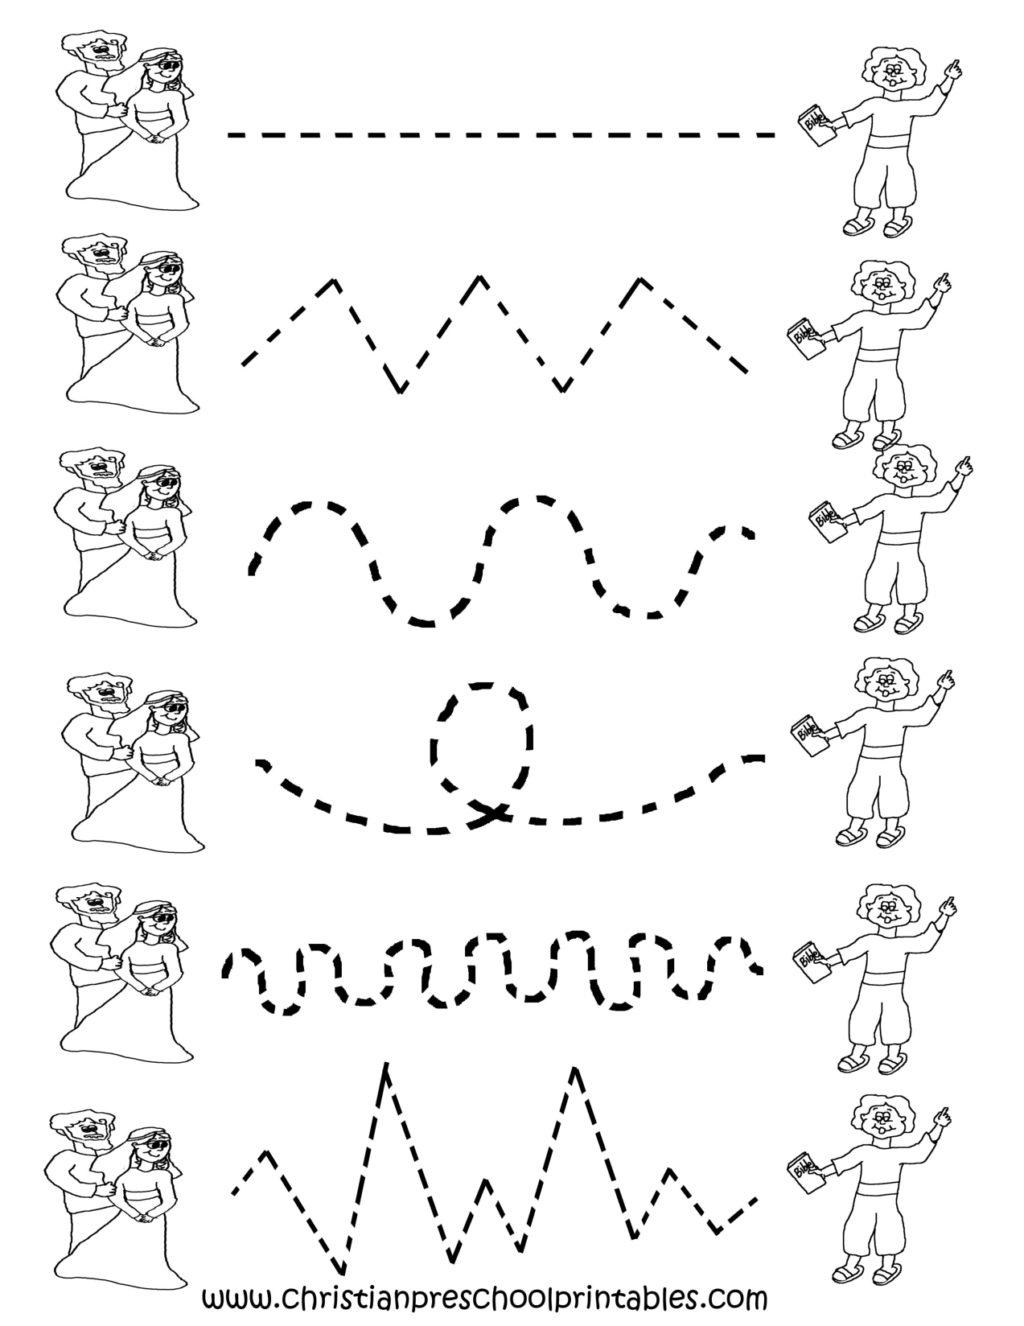 Worksheet ~ Preschool Tracing Worksheets Cakepins Com